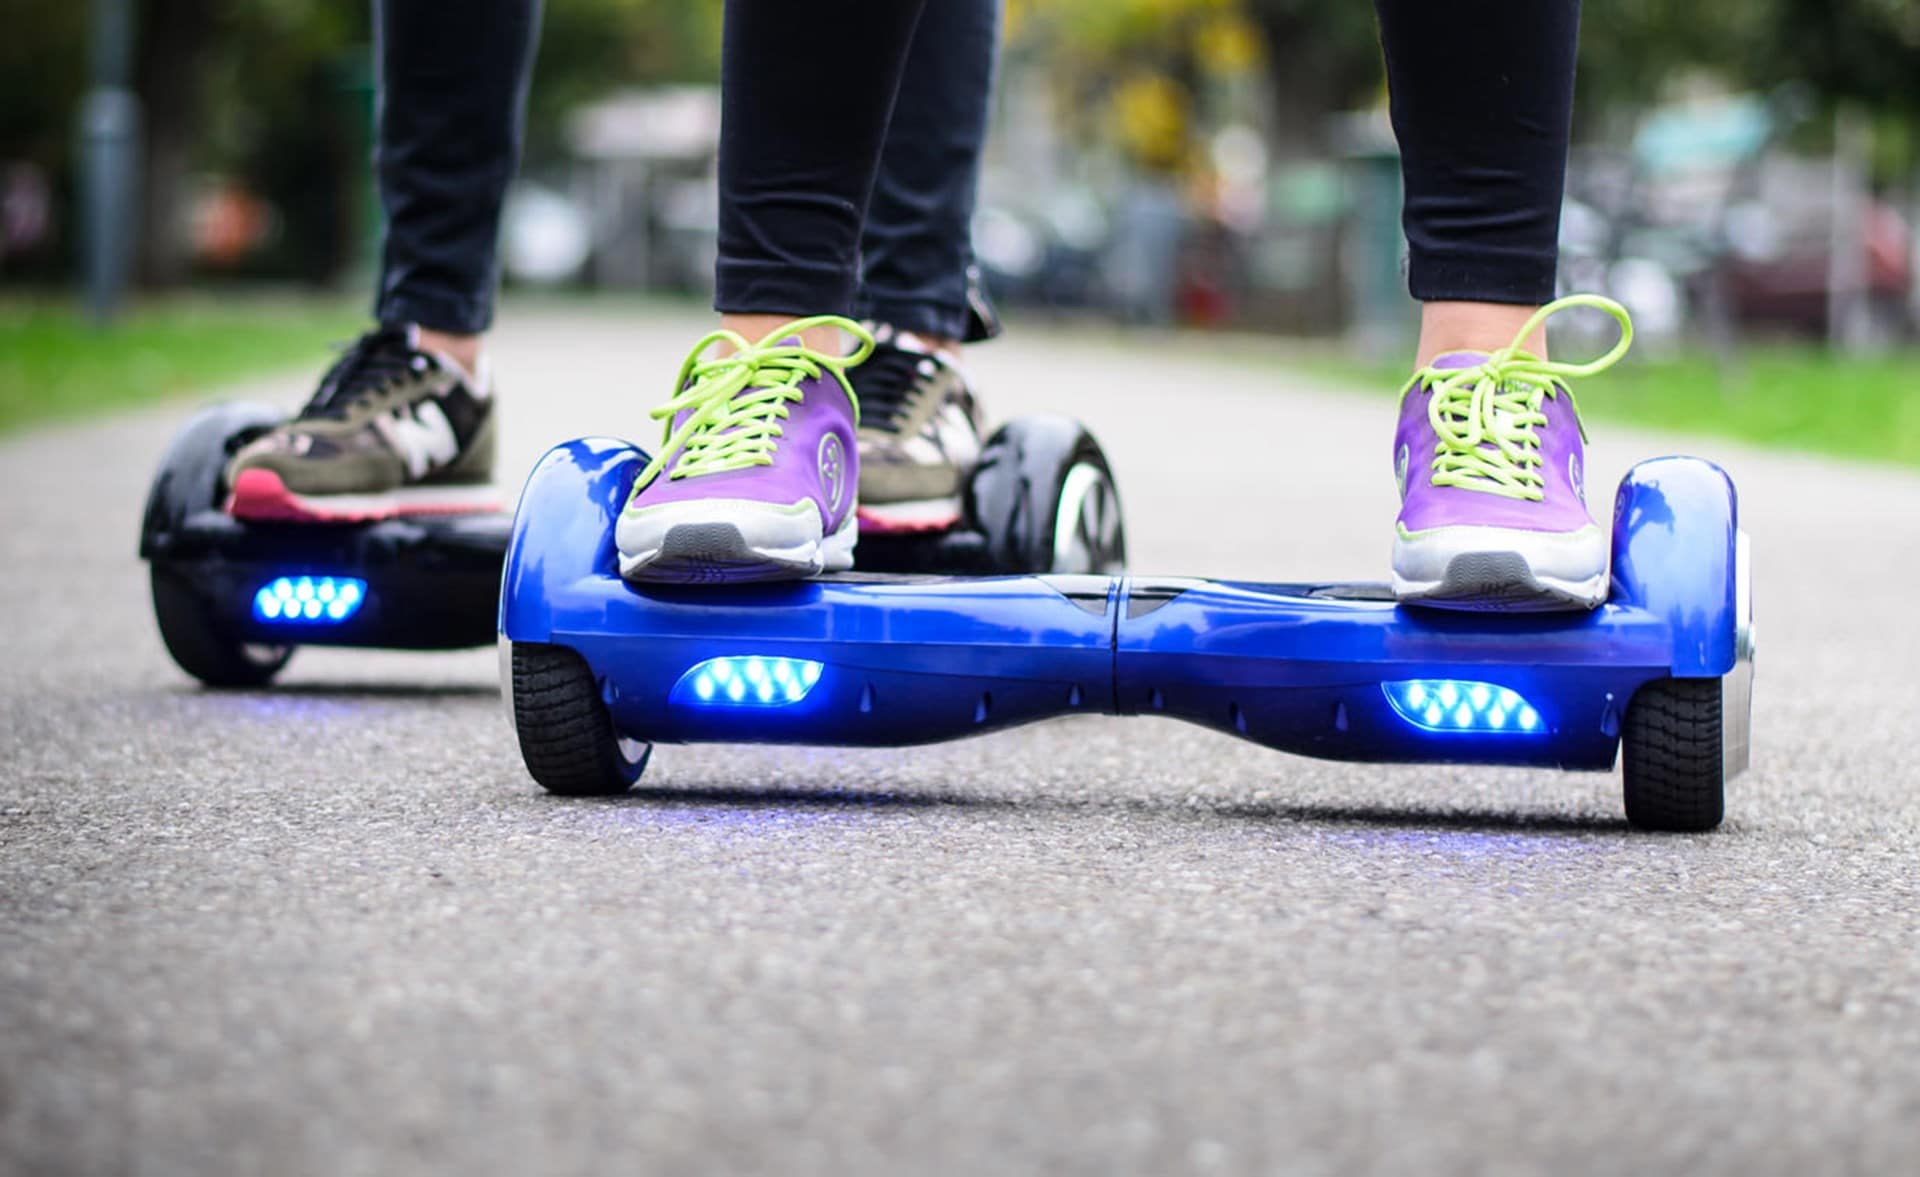 10 Best Hoverboard Under $200 dollar